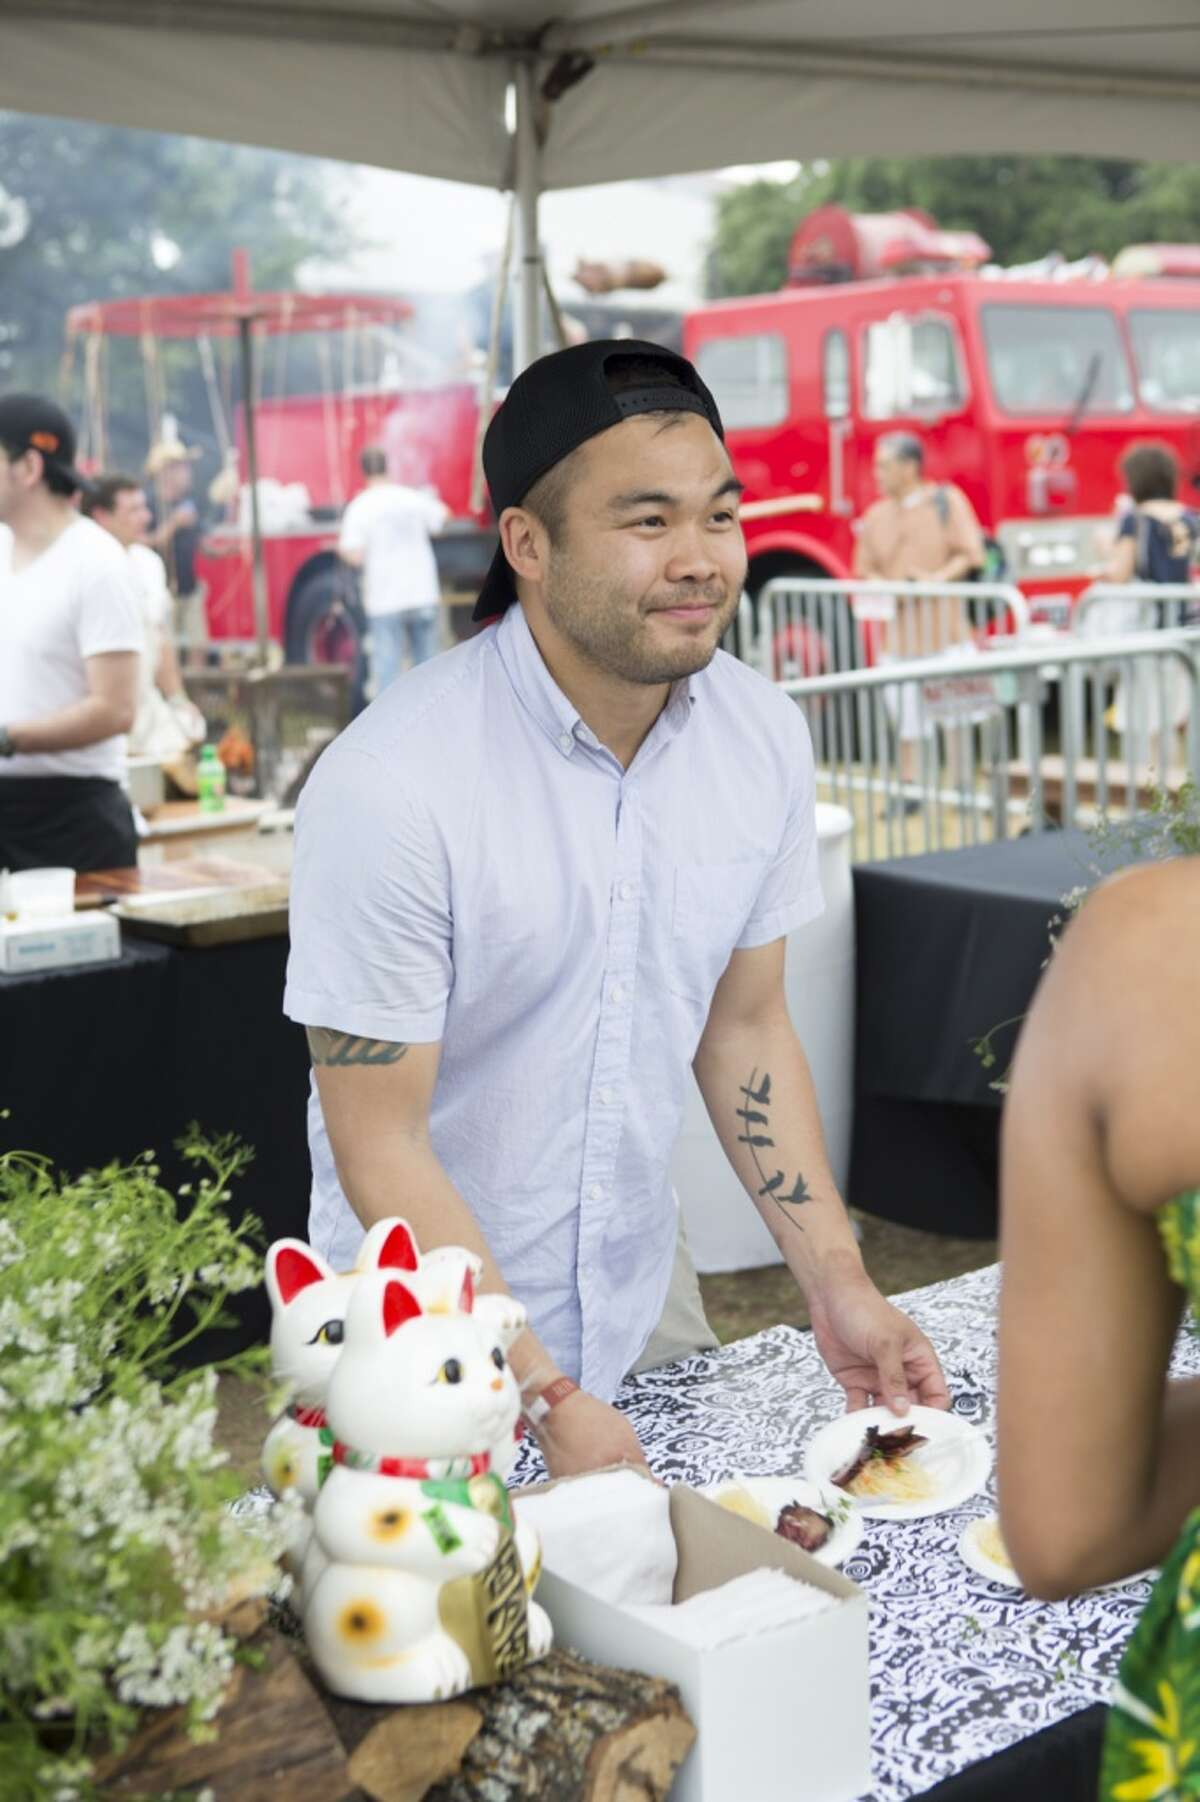 Austin chef Paul Qui at the 2014 Austin Food + Wine Festival.